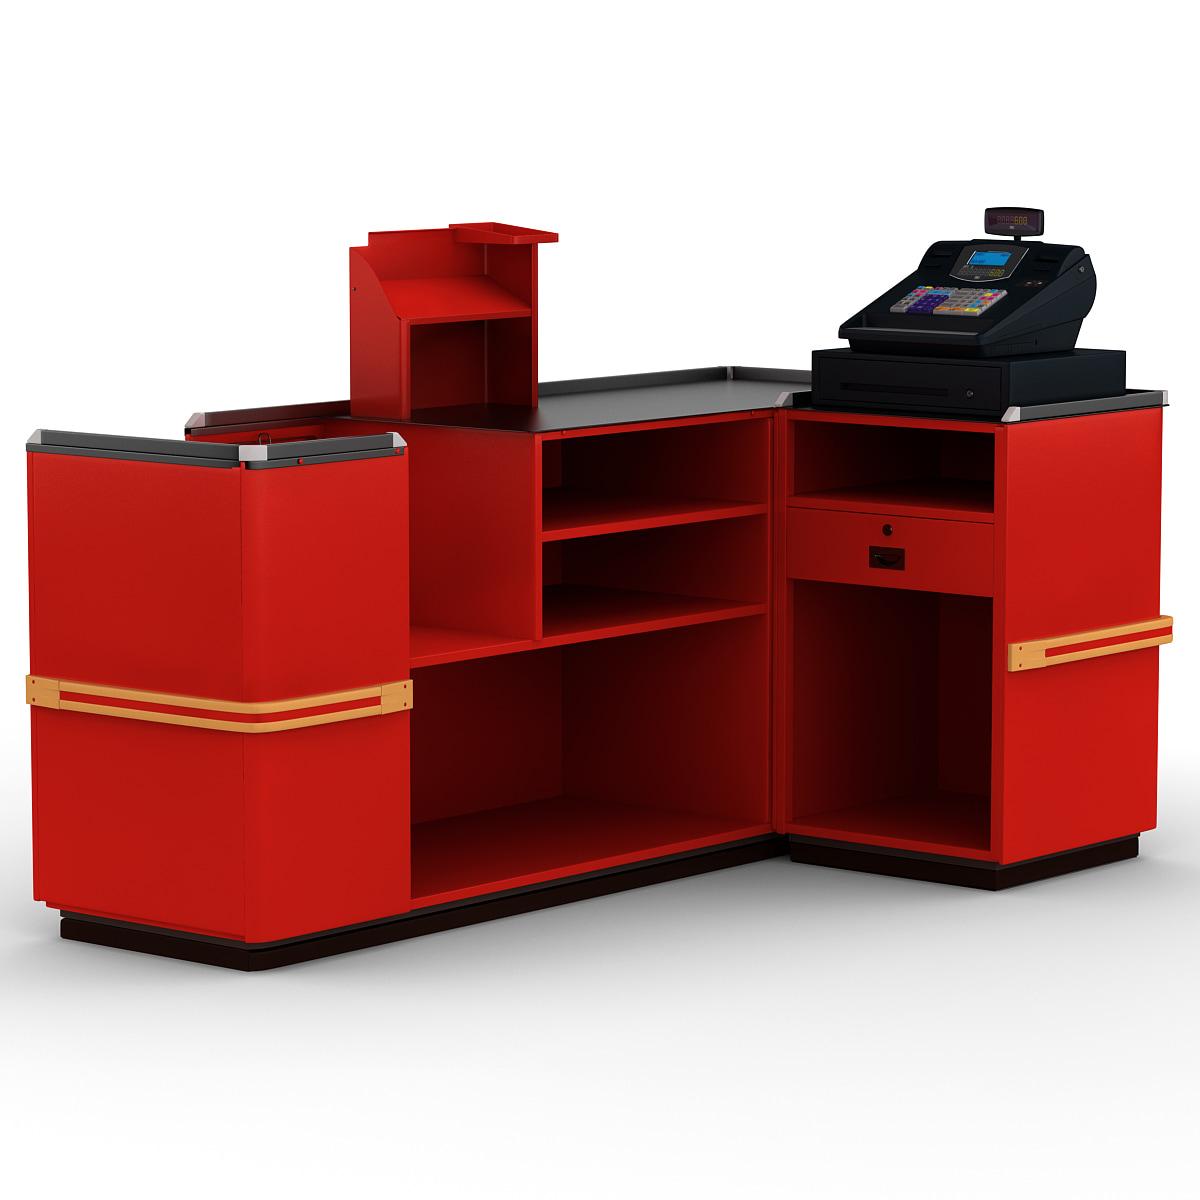 3d model of cash counter 6